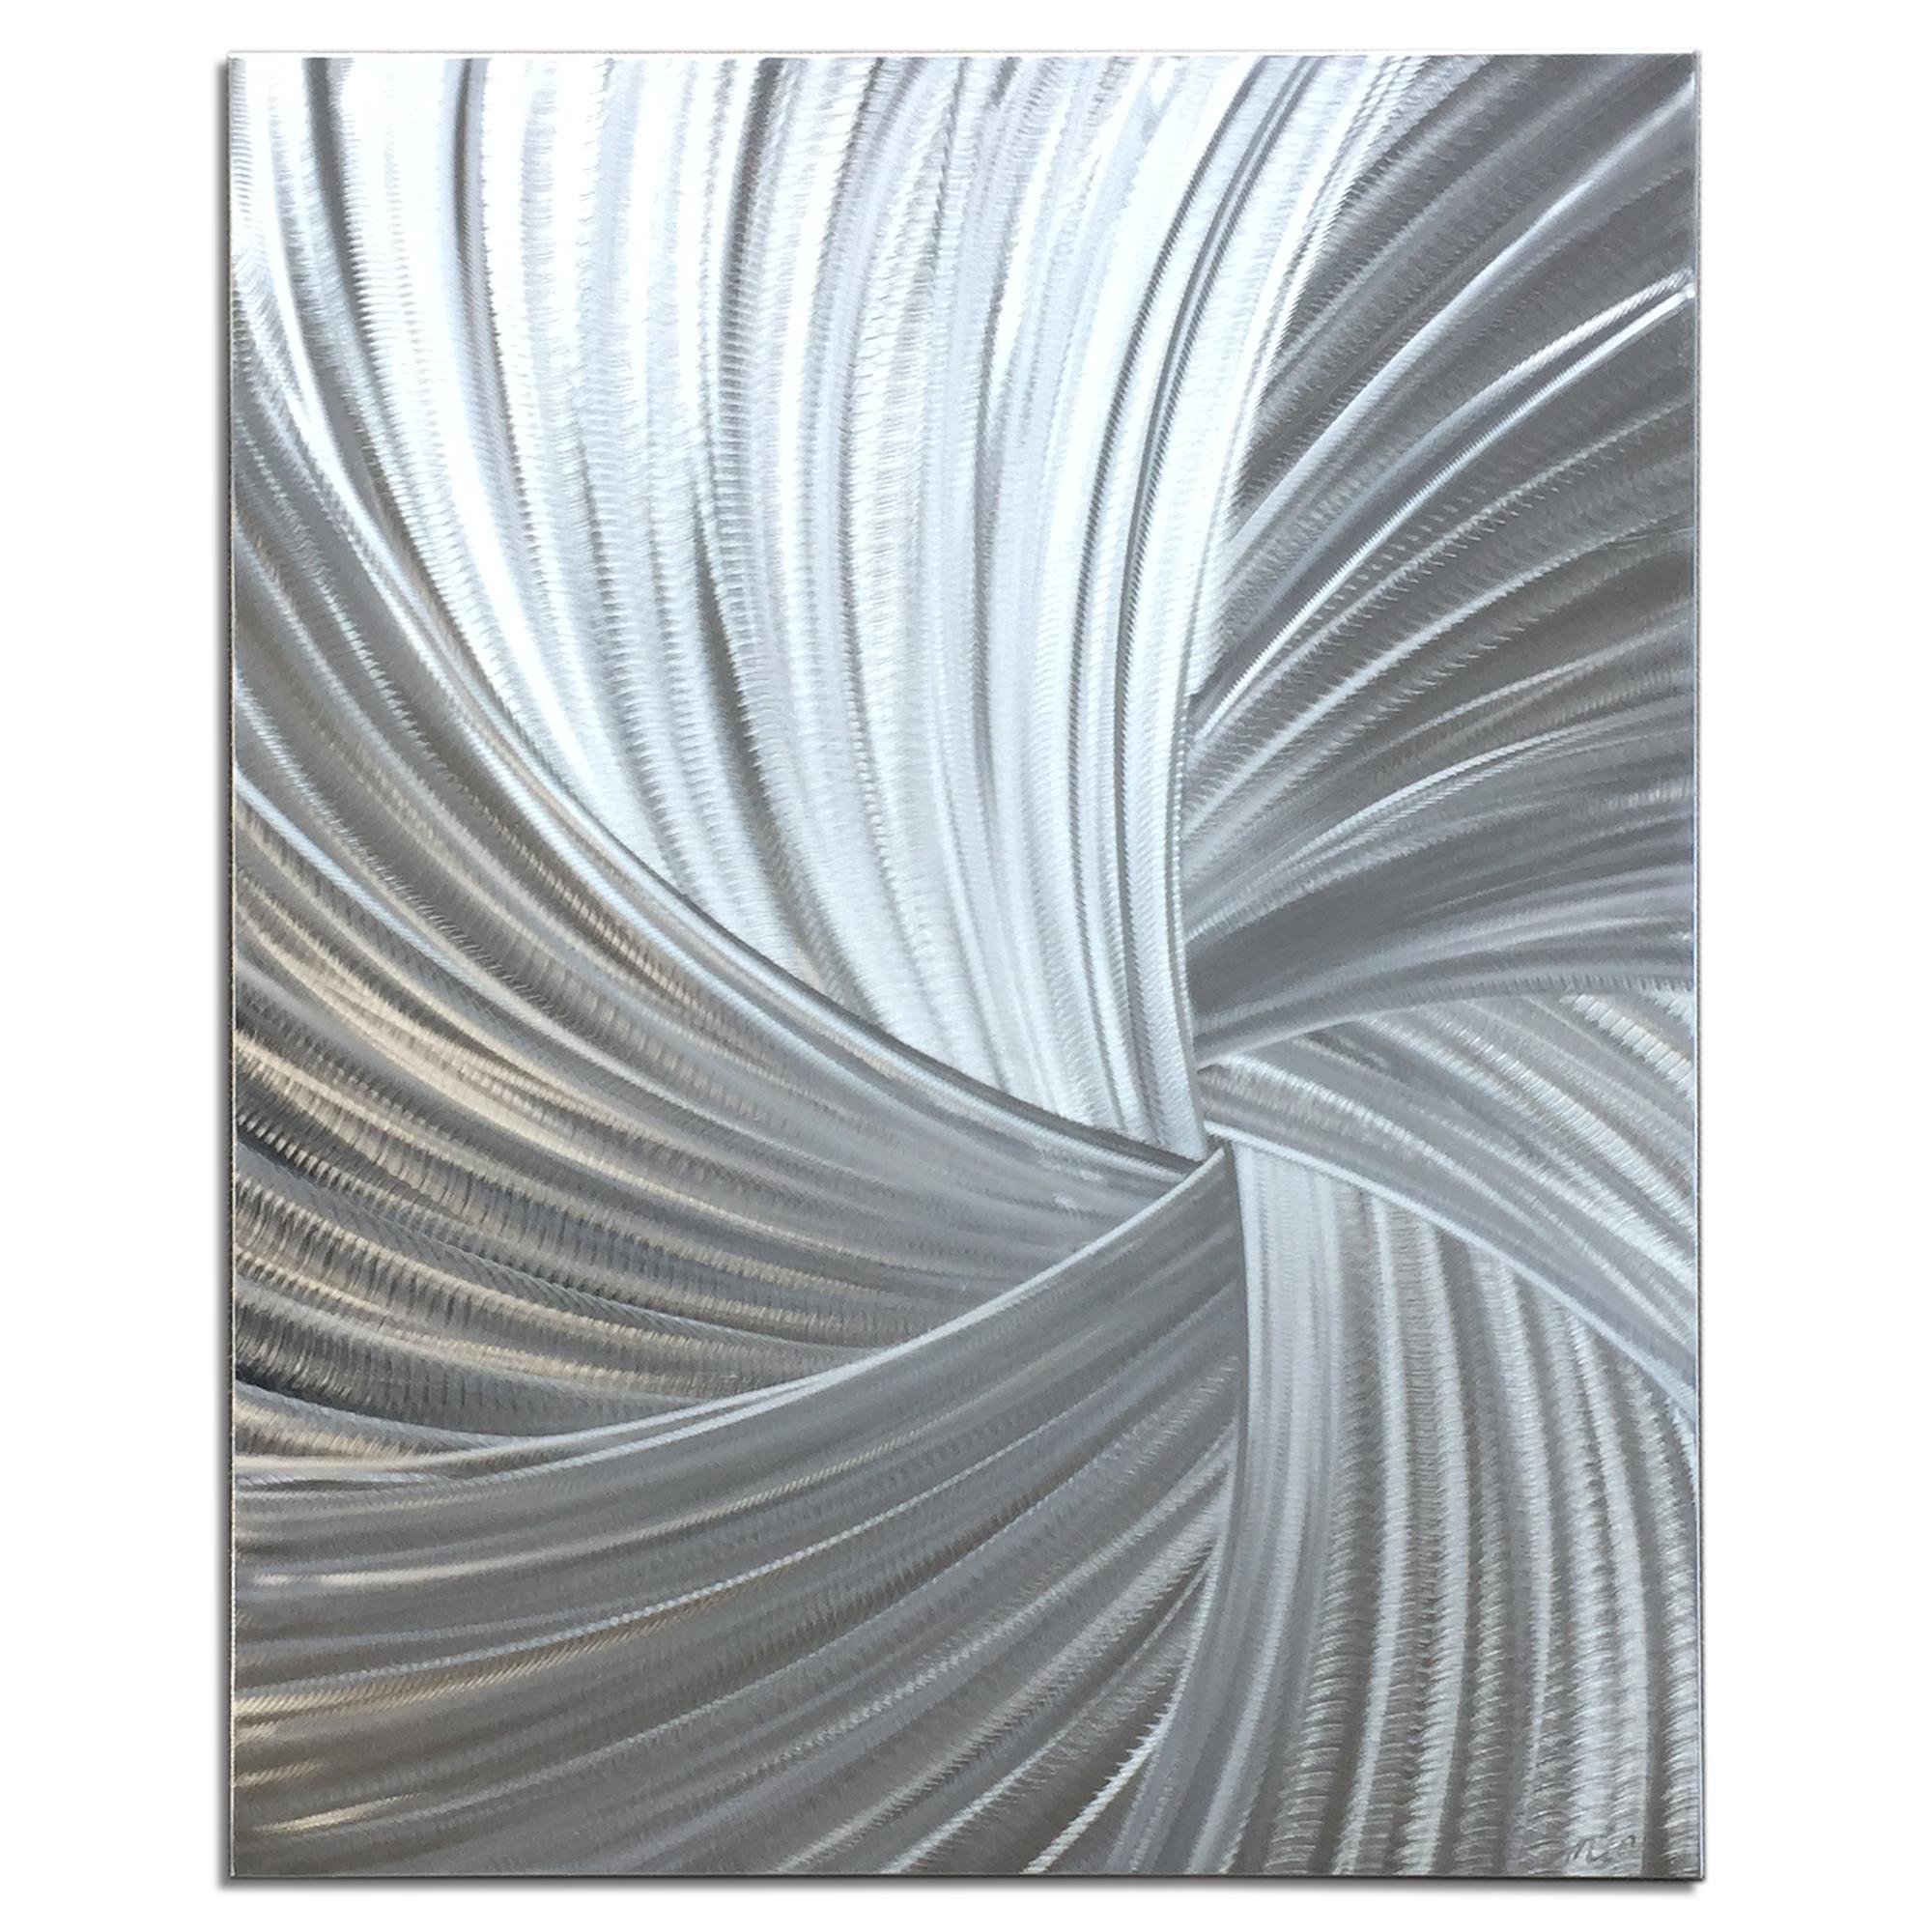 Starburst Metal Art 'Within the Folds' - Modern Artwork on Natural Aluminum